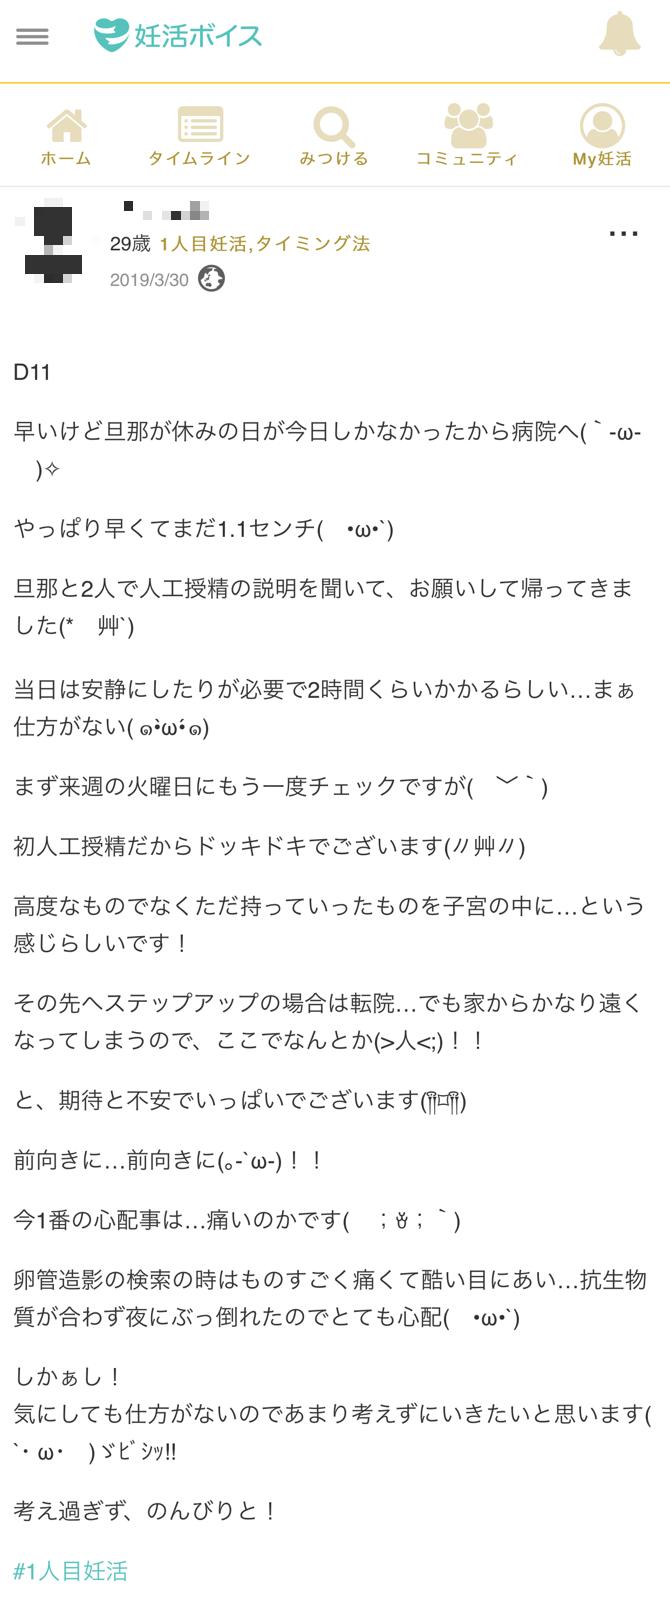 Nさん(29歳・1人目妊活・タイミング法)